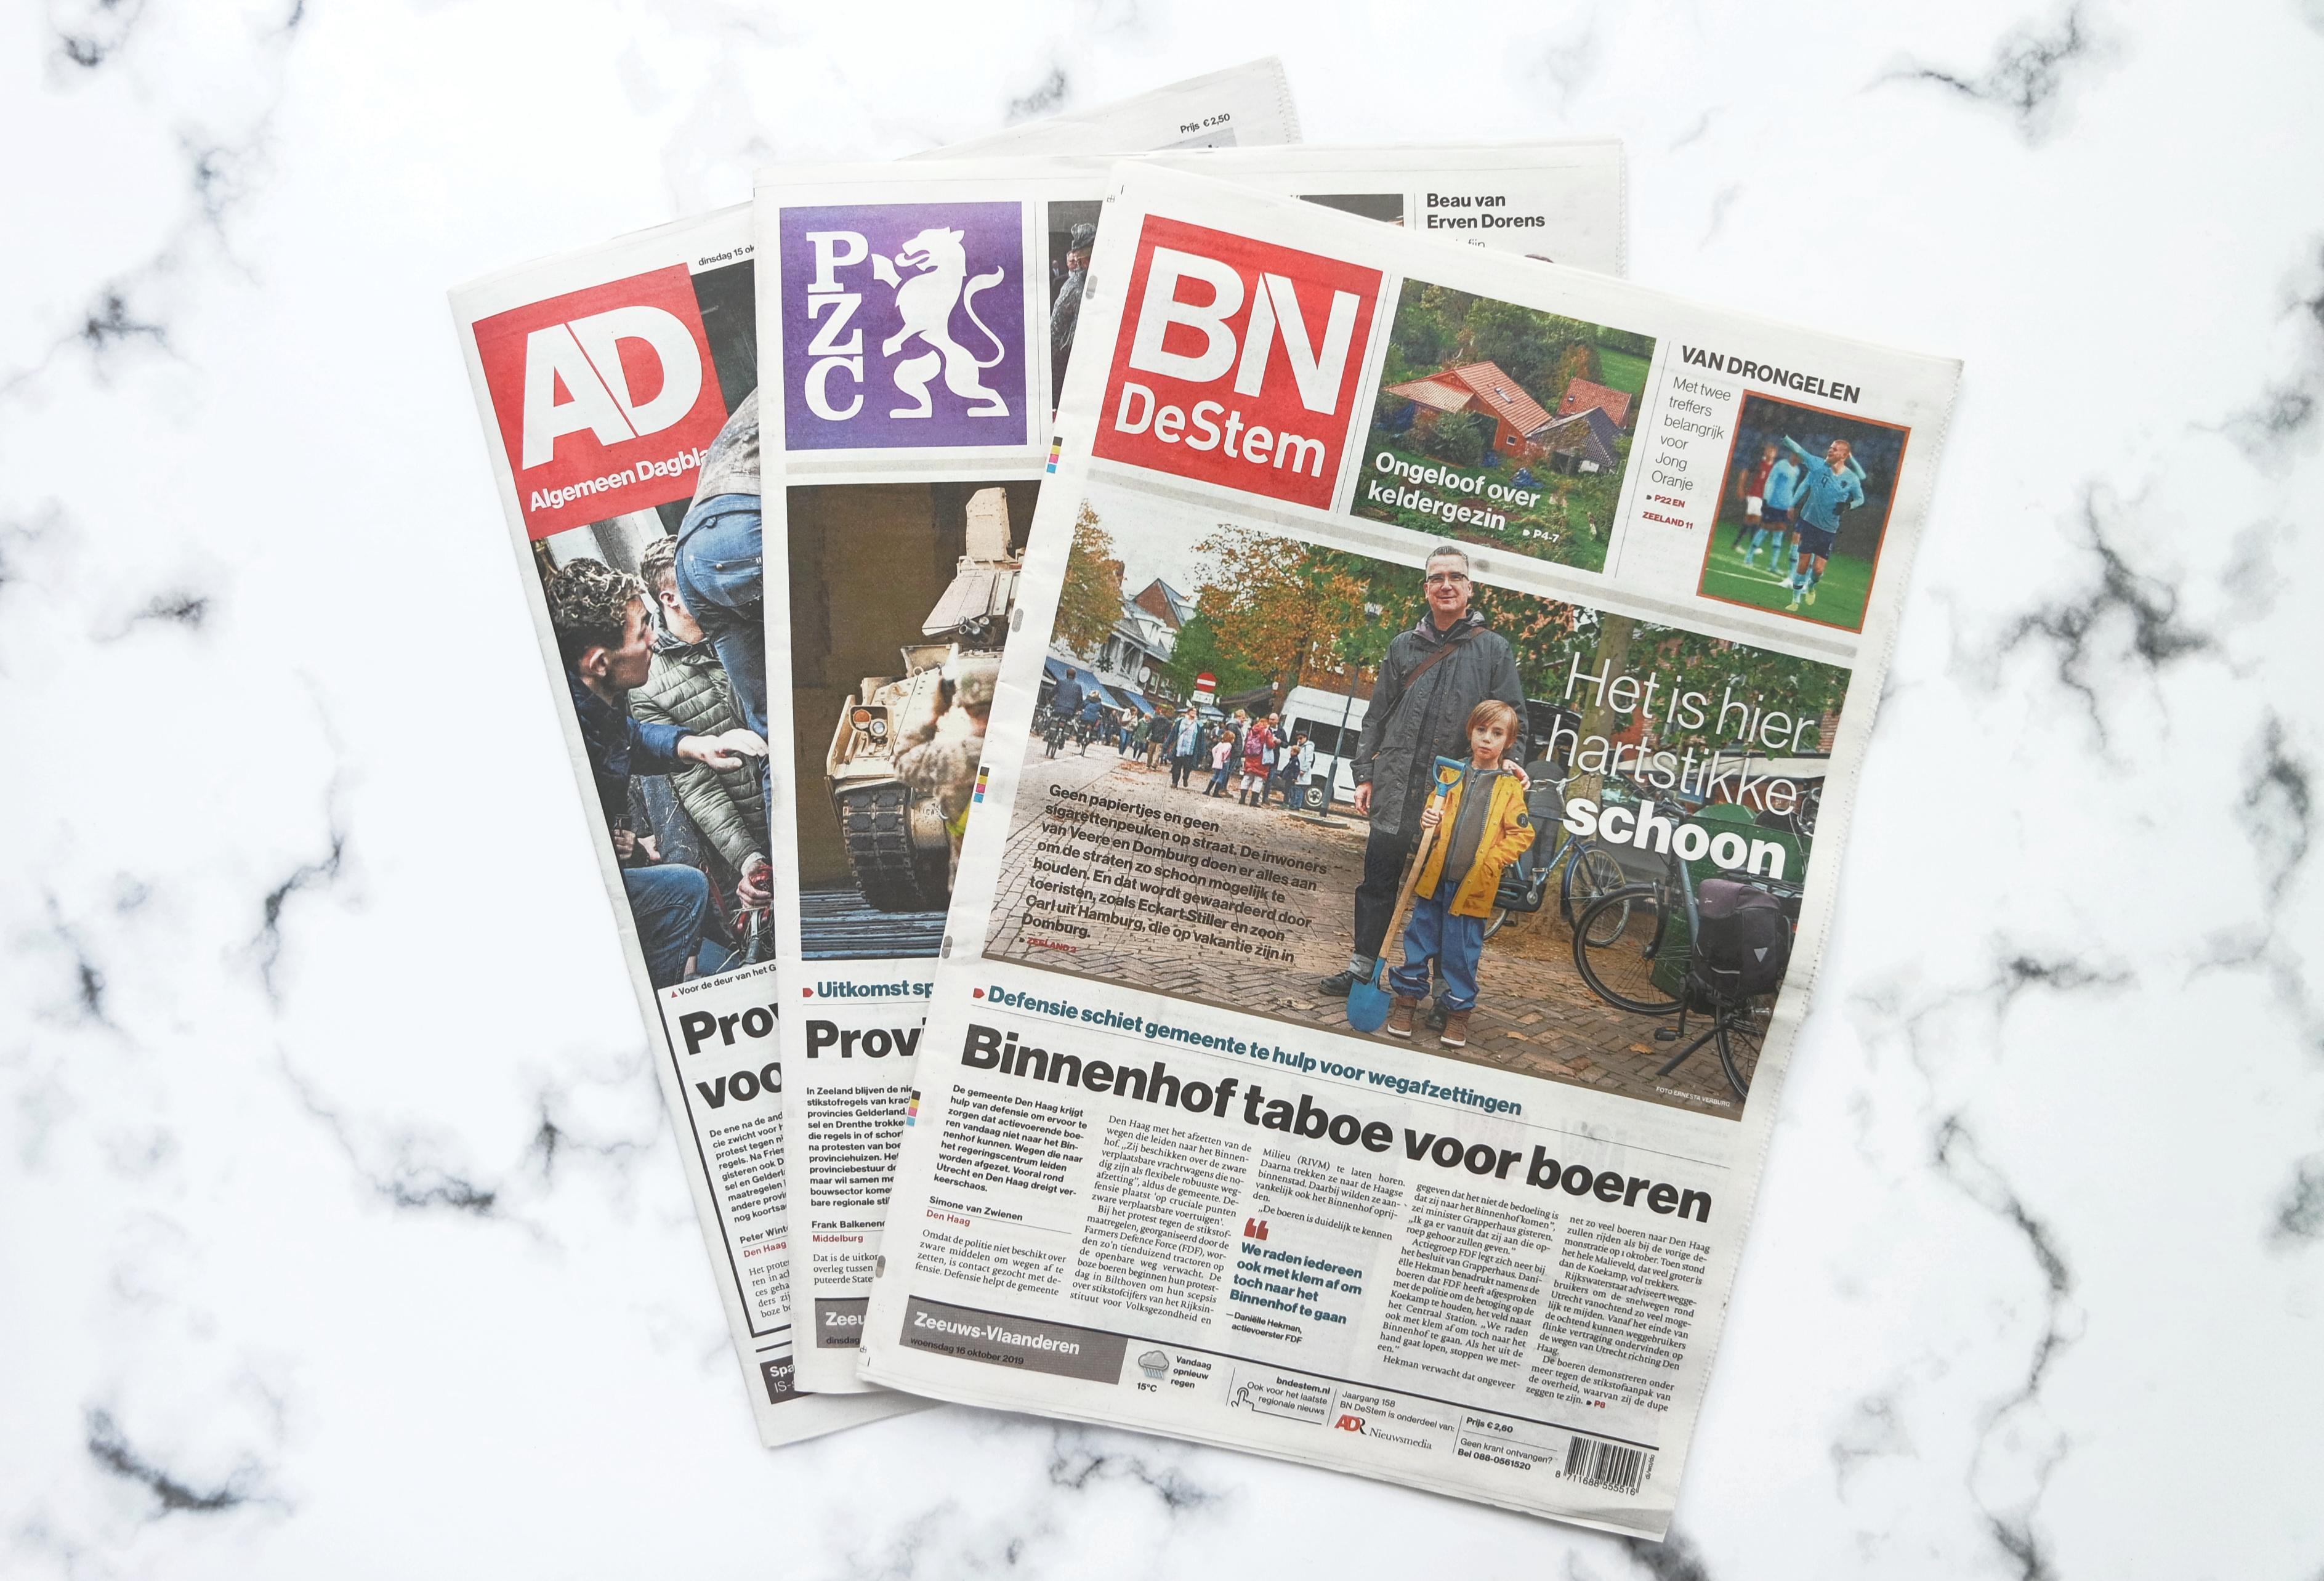 Journalist PZC BN DeStem AD